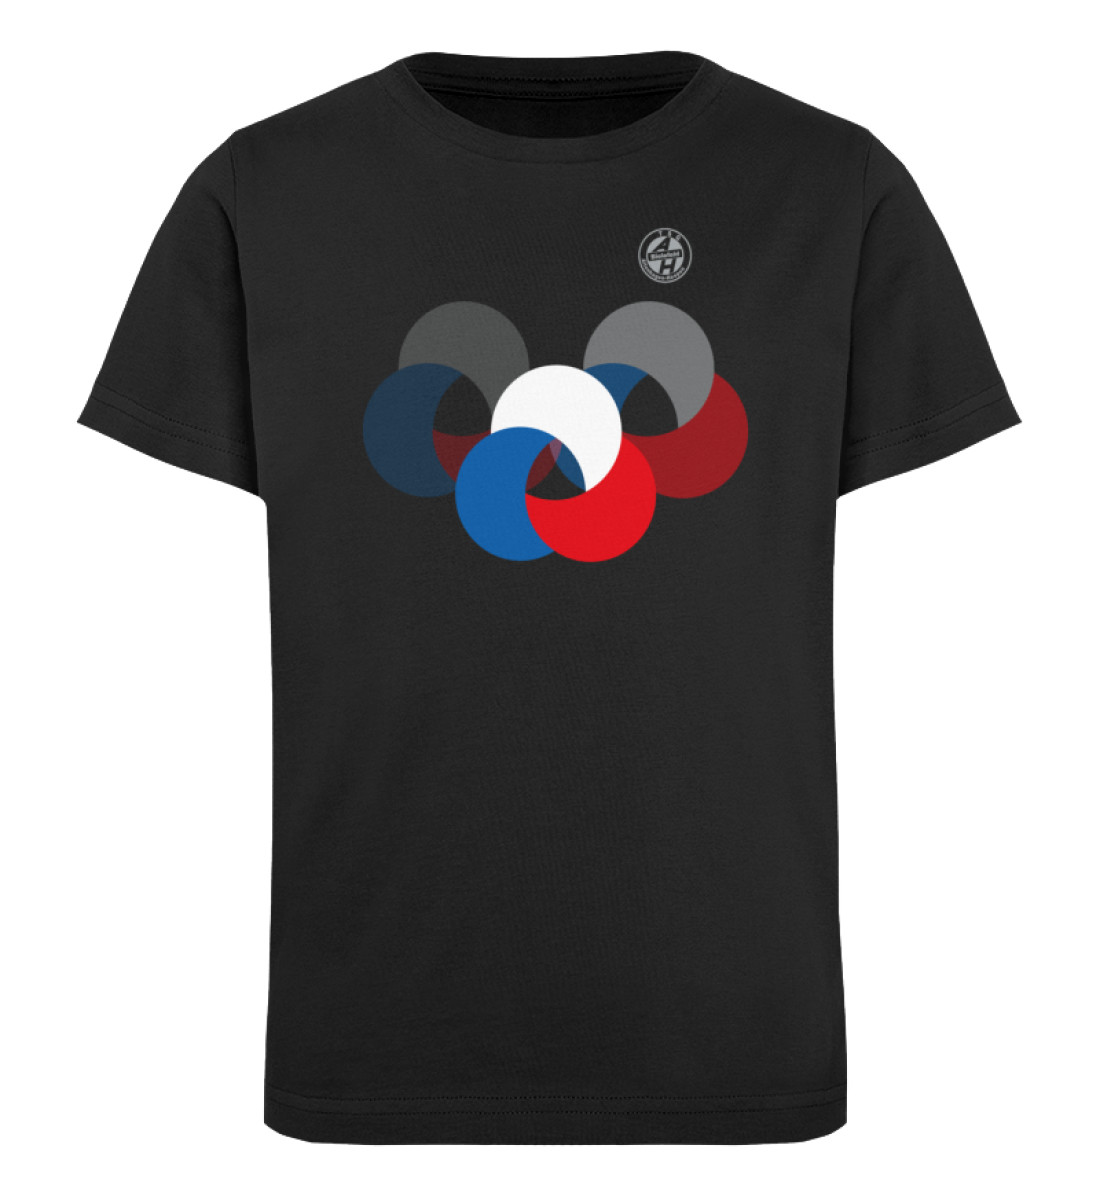 Spectrum - Kinder Organic T-Shirt-16